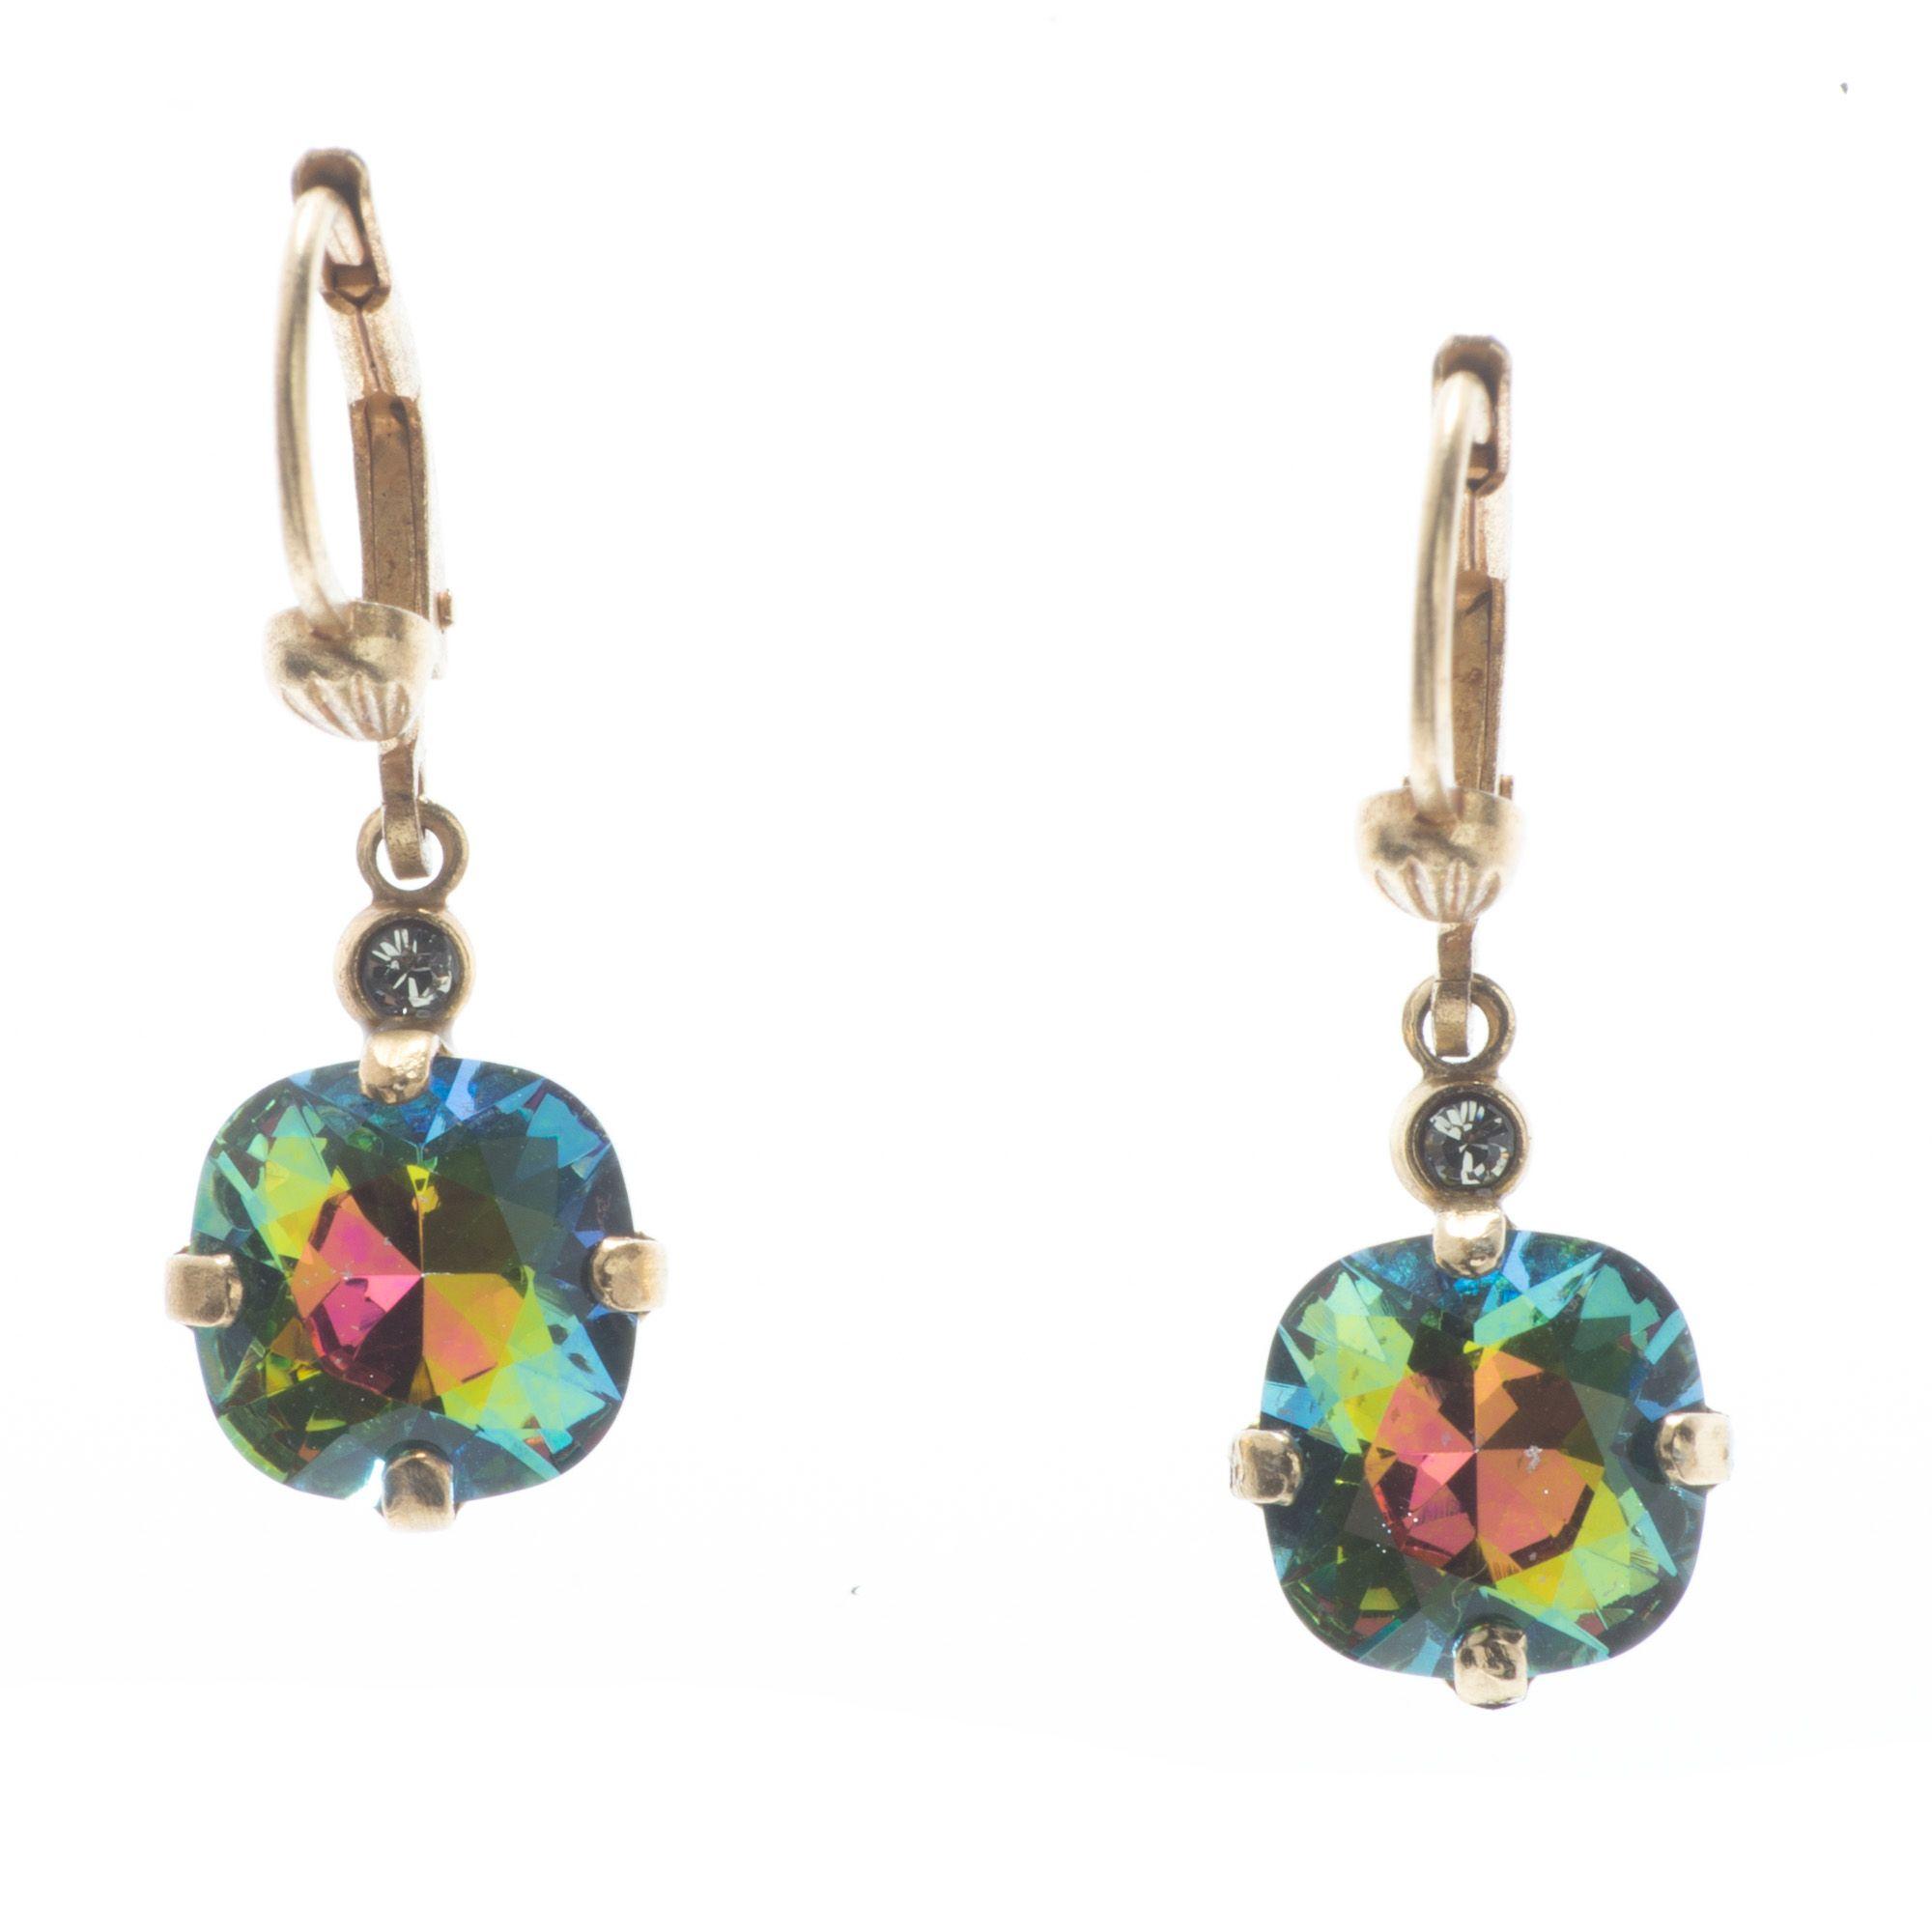 51e9a0c2e9ac3 Sweet! Petite Catherine Popesco 8mm Crystal Dangle Earrings - Assorted  Colors